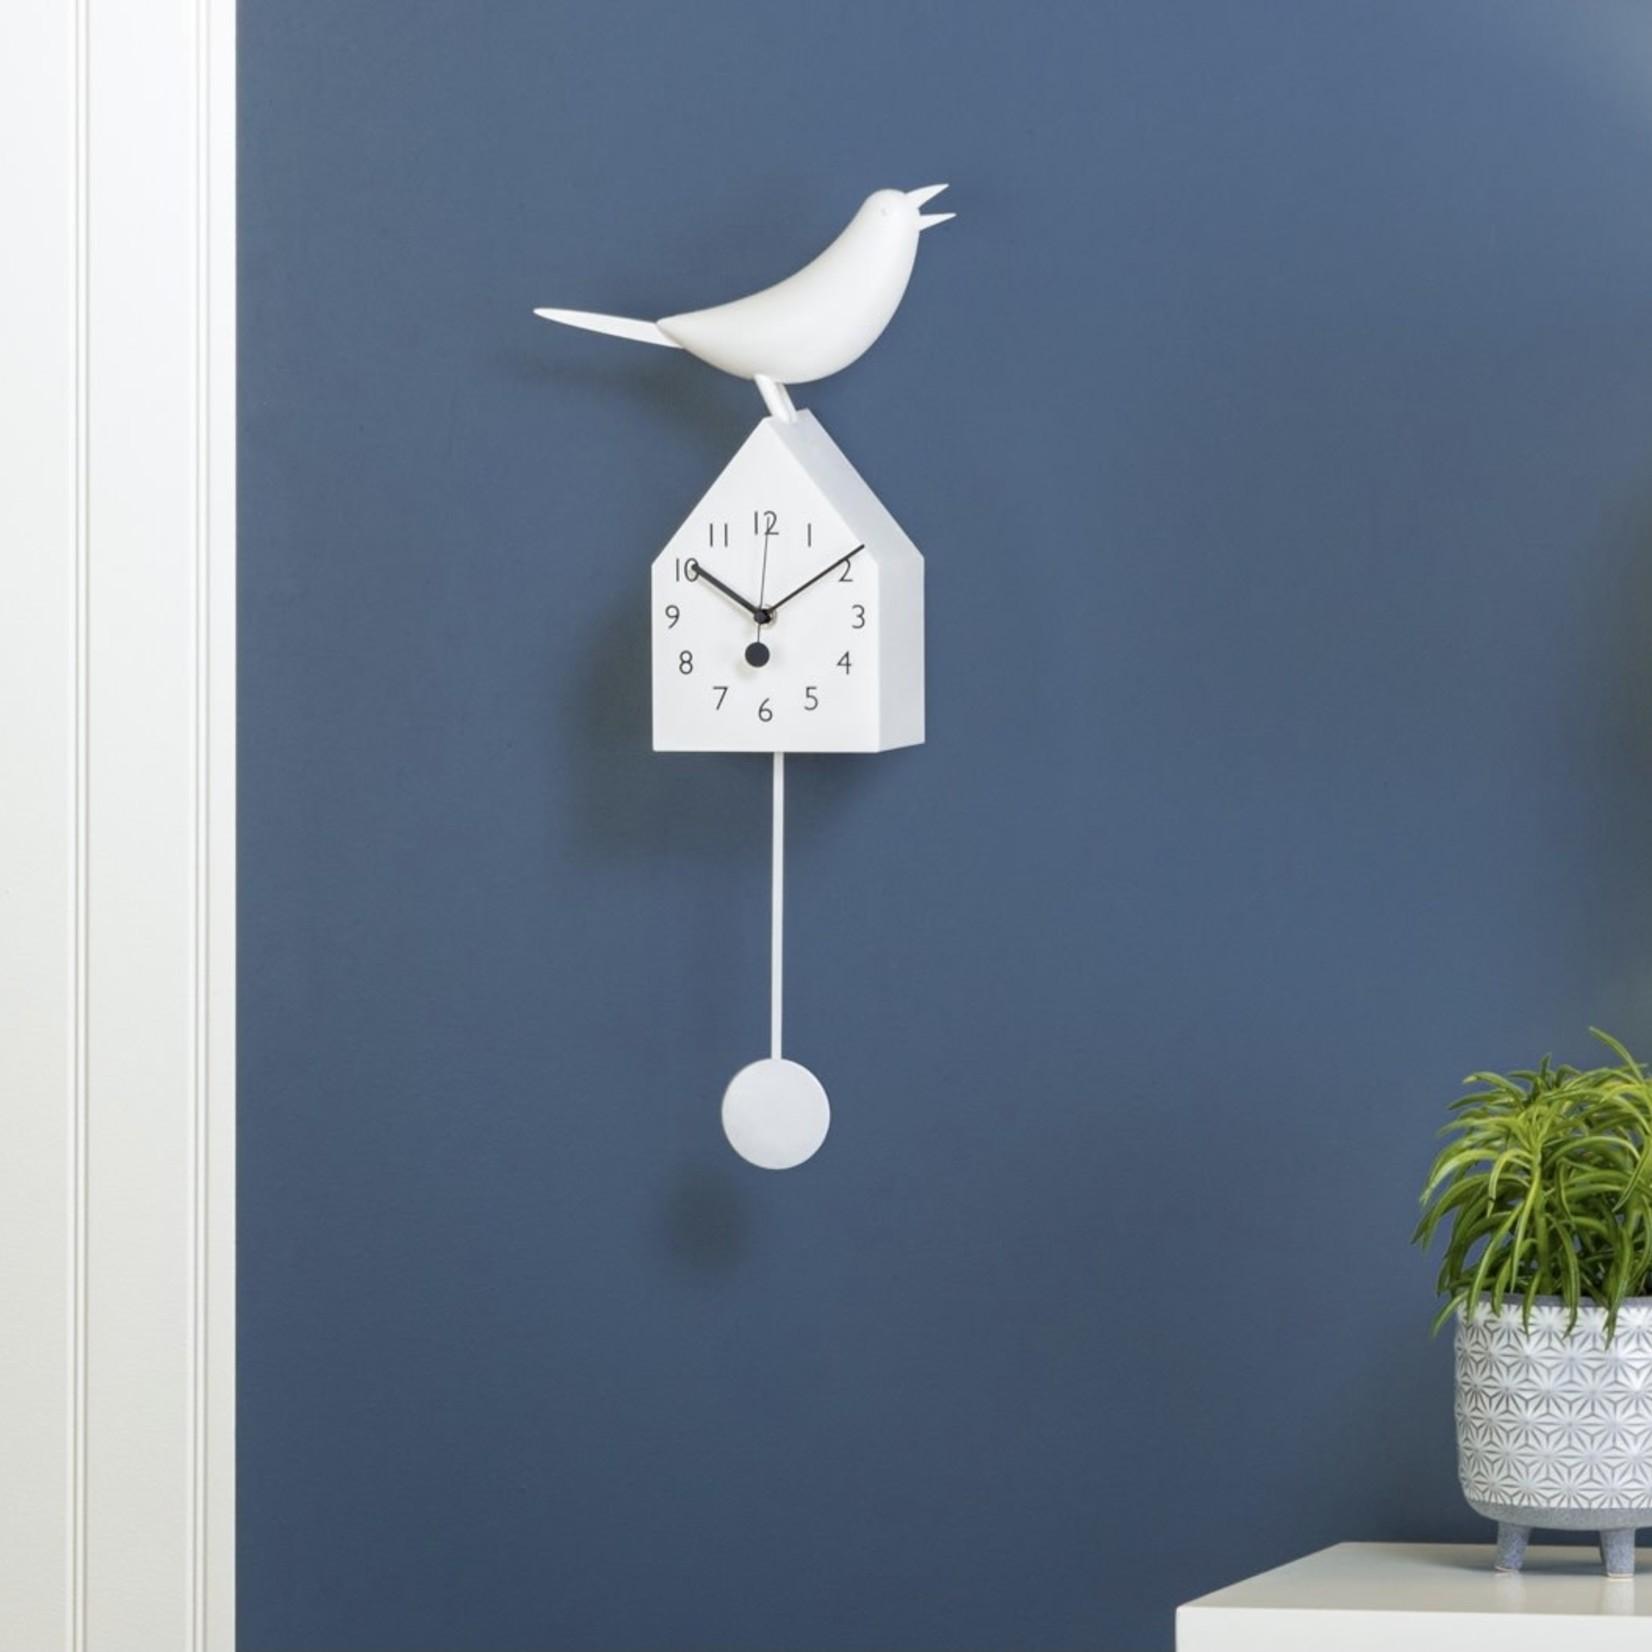 Torre & Tagus Motion Birdhouse Clock - White